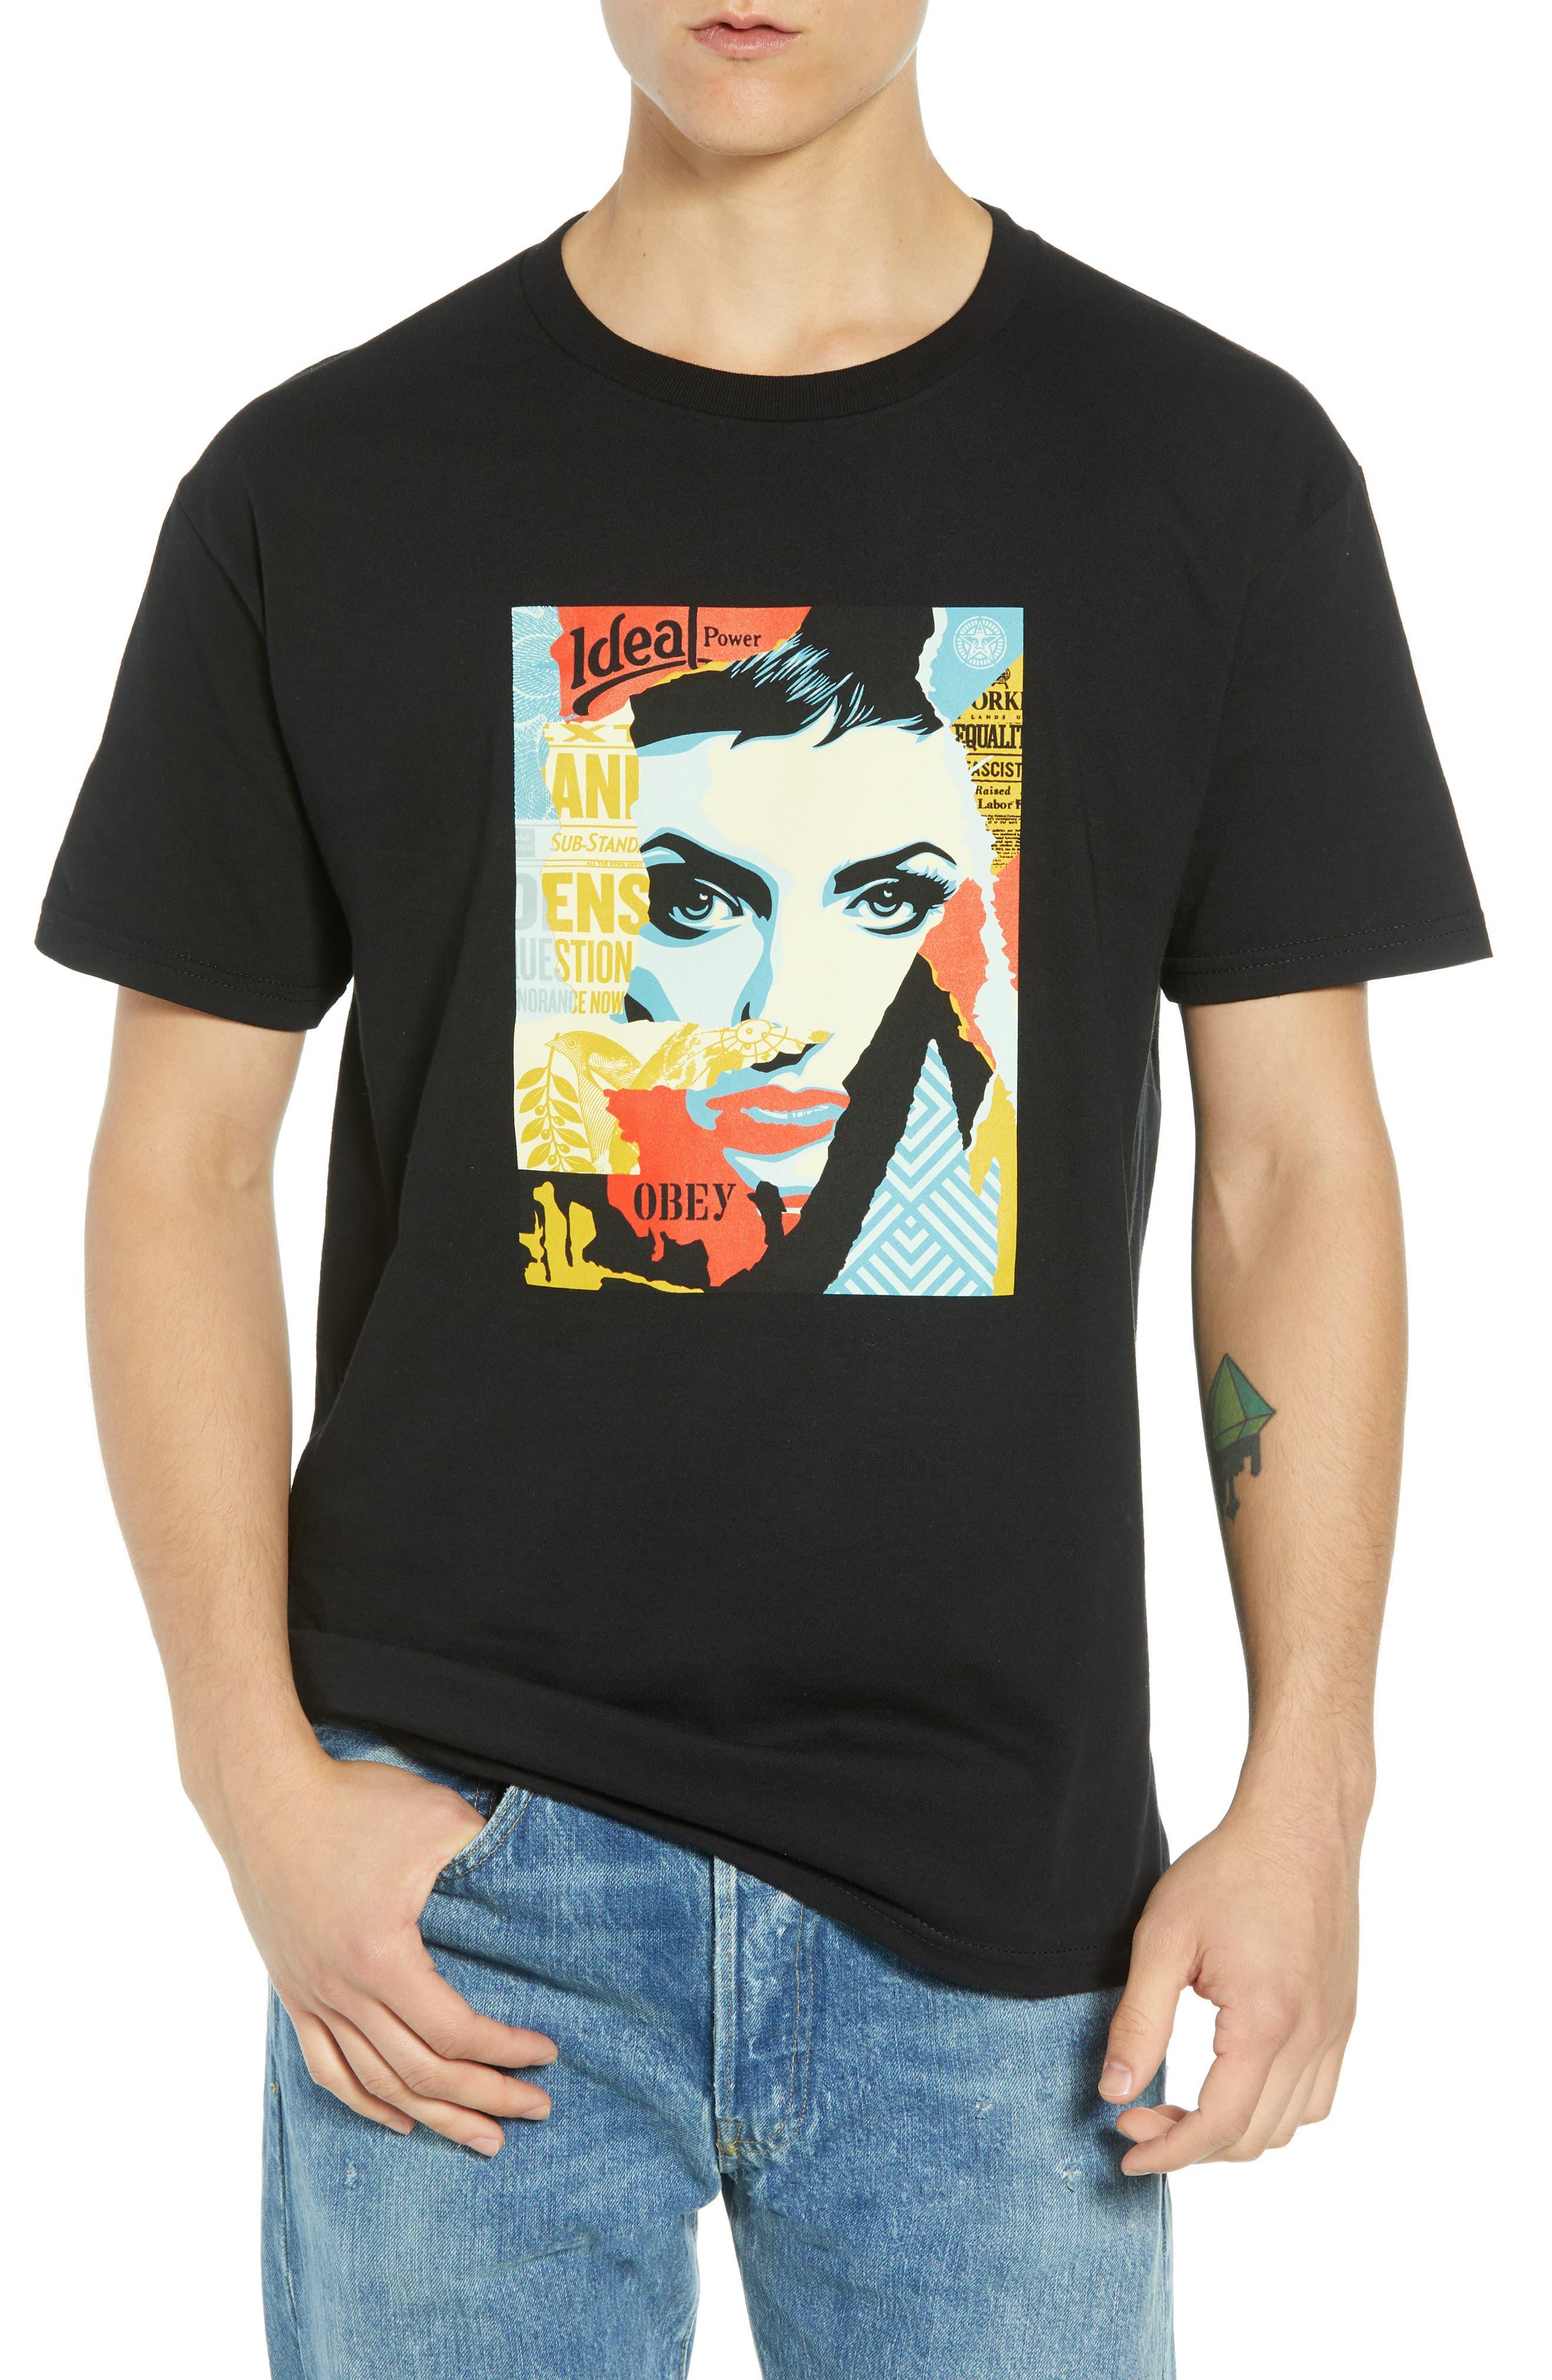 Ideal Power Premium T-Shirt,                             Main thumbnail 1, color,                             BLACK